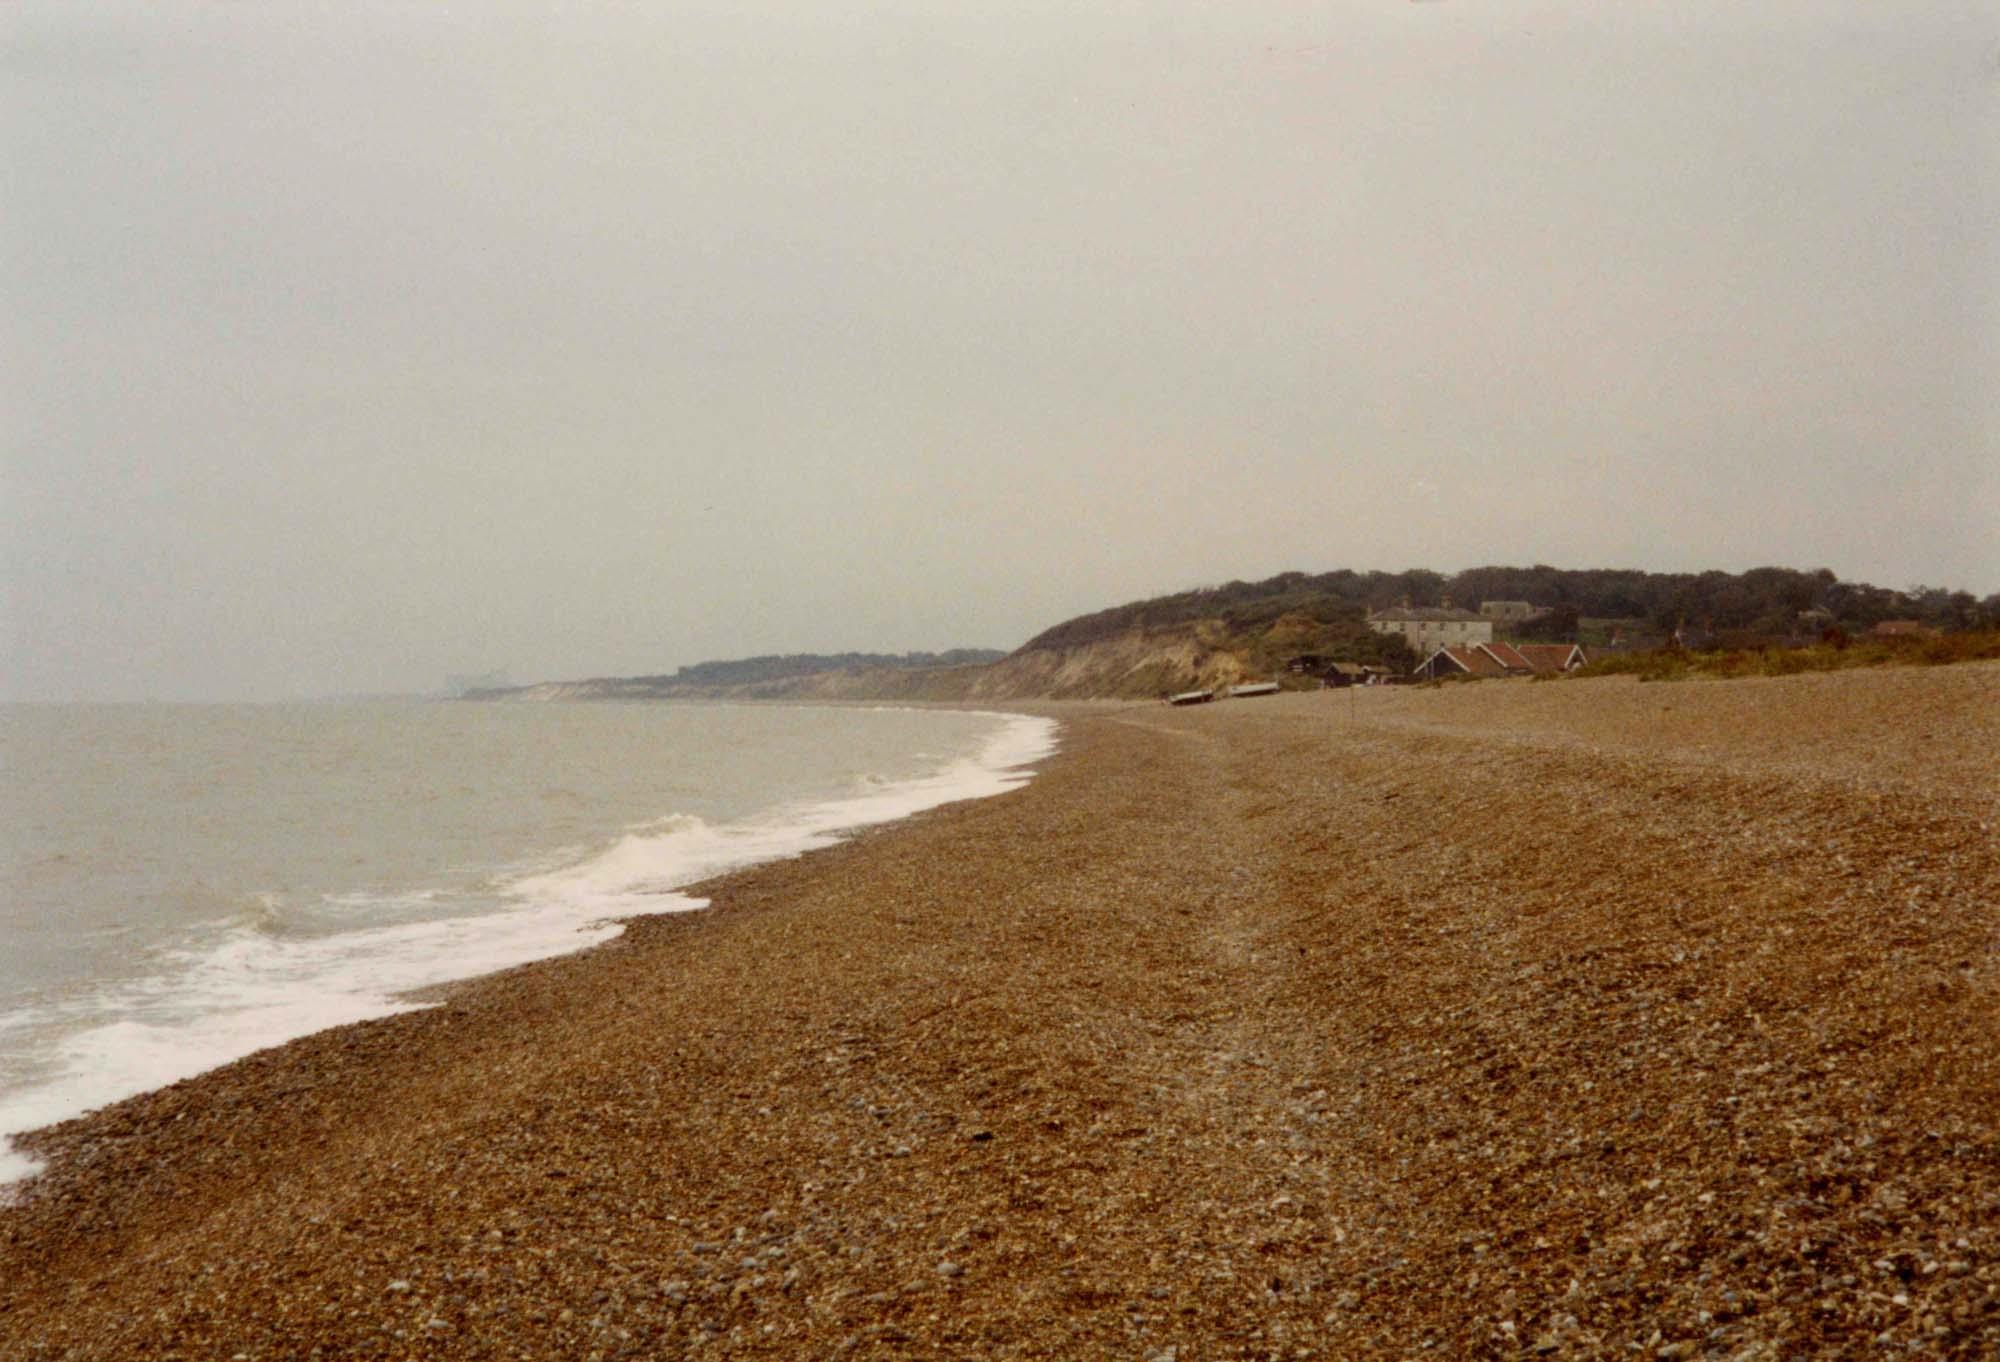 a photo across the shore of a shingle beach towards a headland